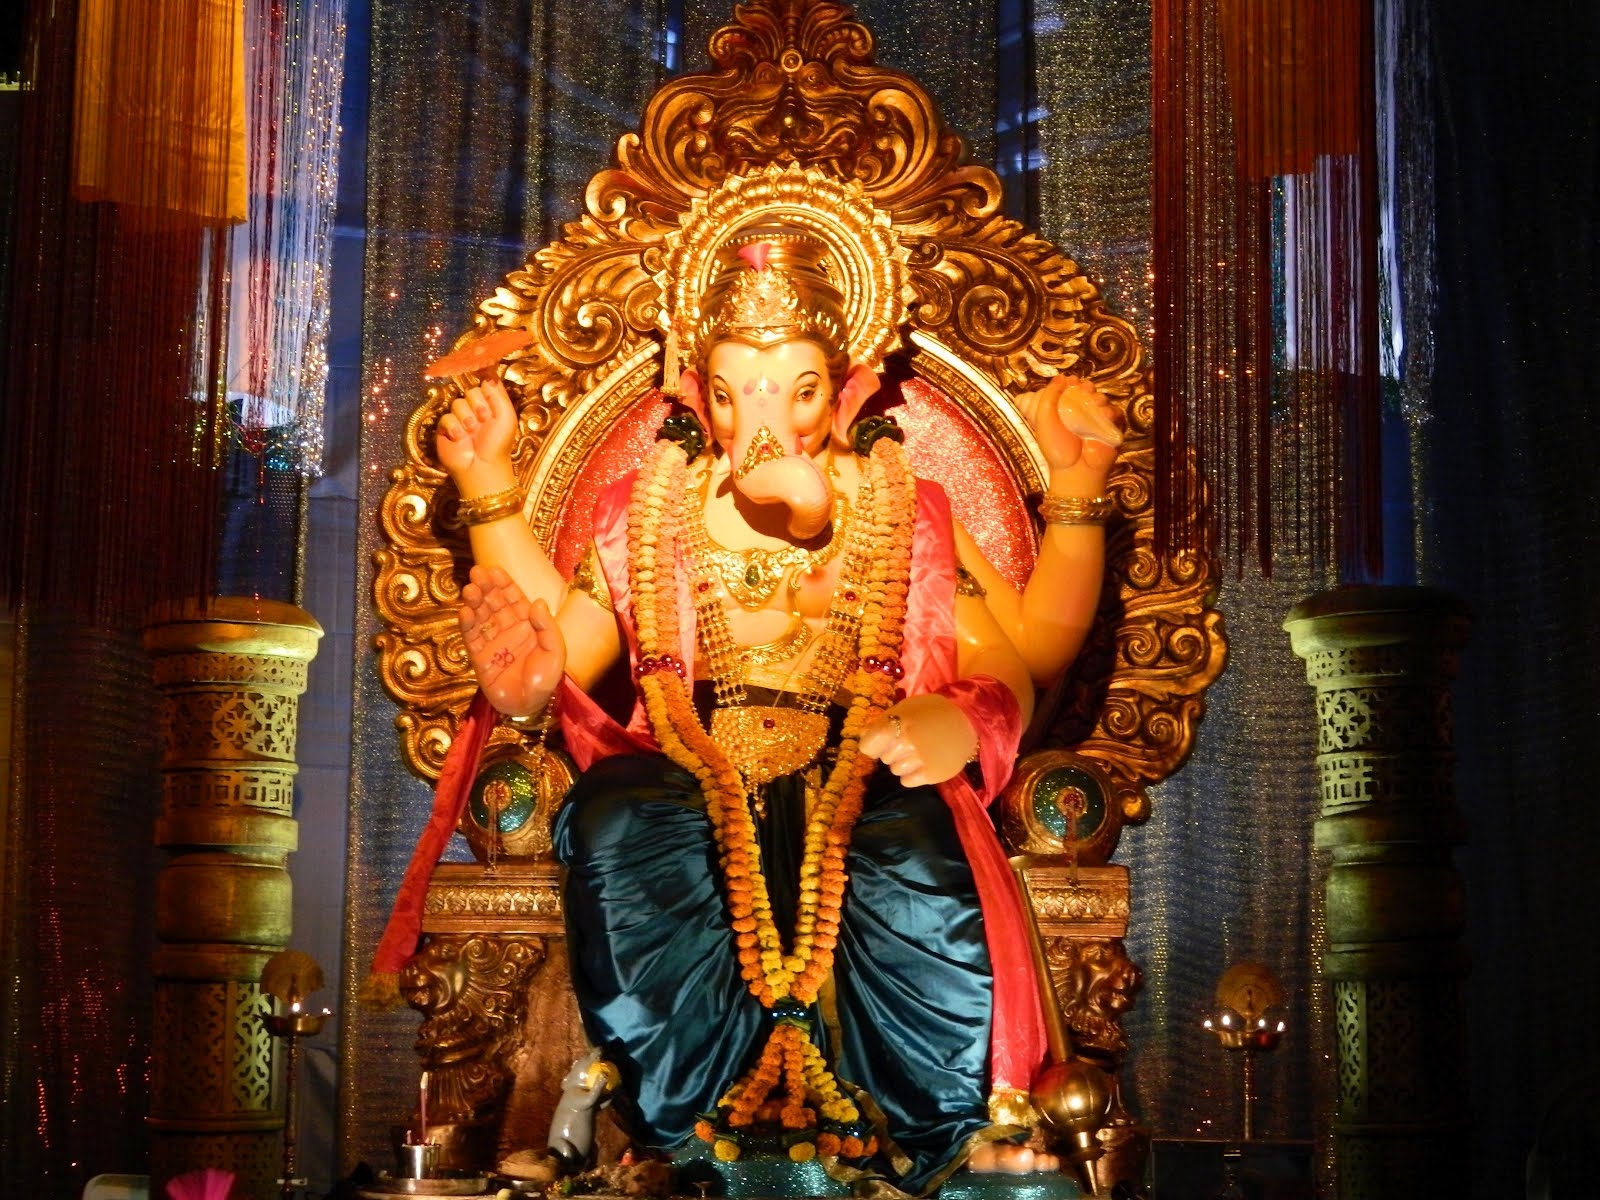 lord ganesha hd wallpapers free download | ganesh chaturthi